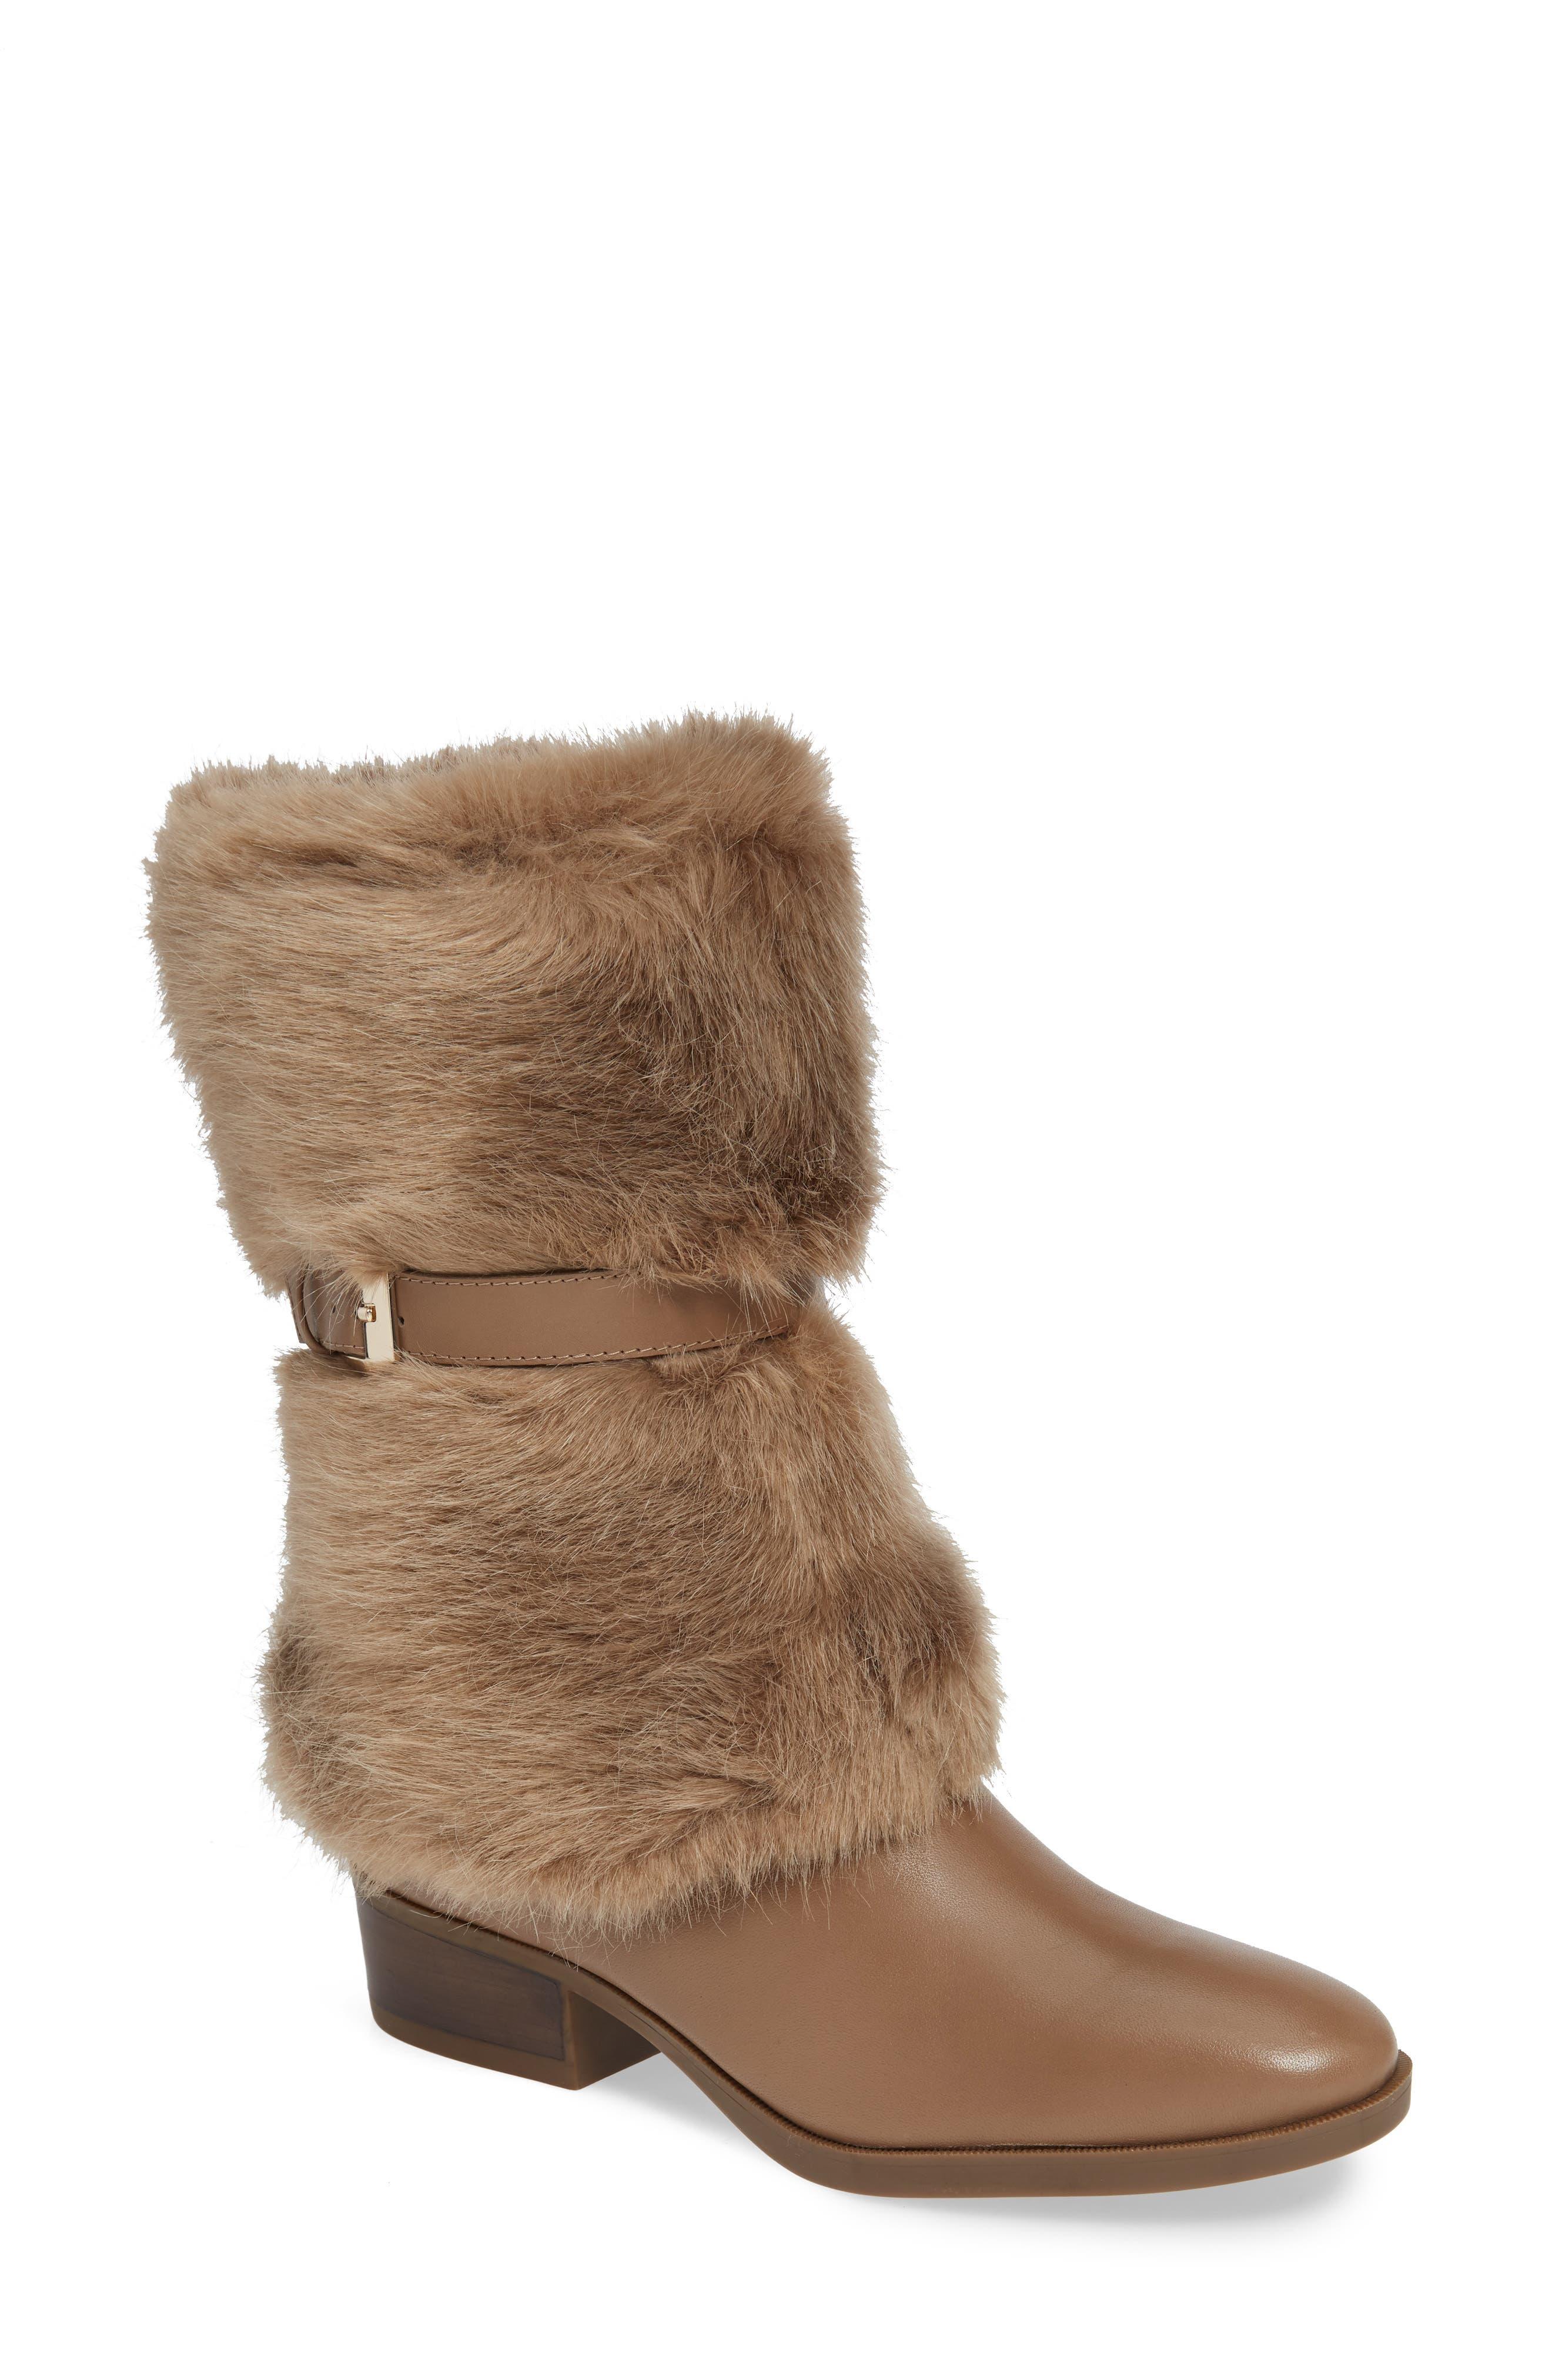 Taryn Rose Giselle Water Resistant Faux Fur Boot, Brown